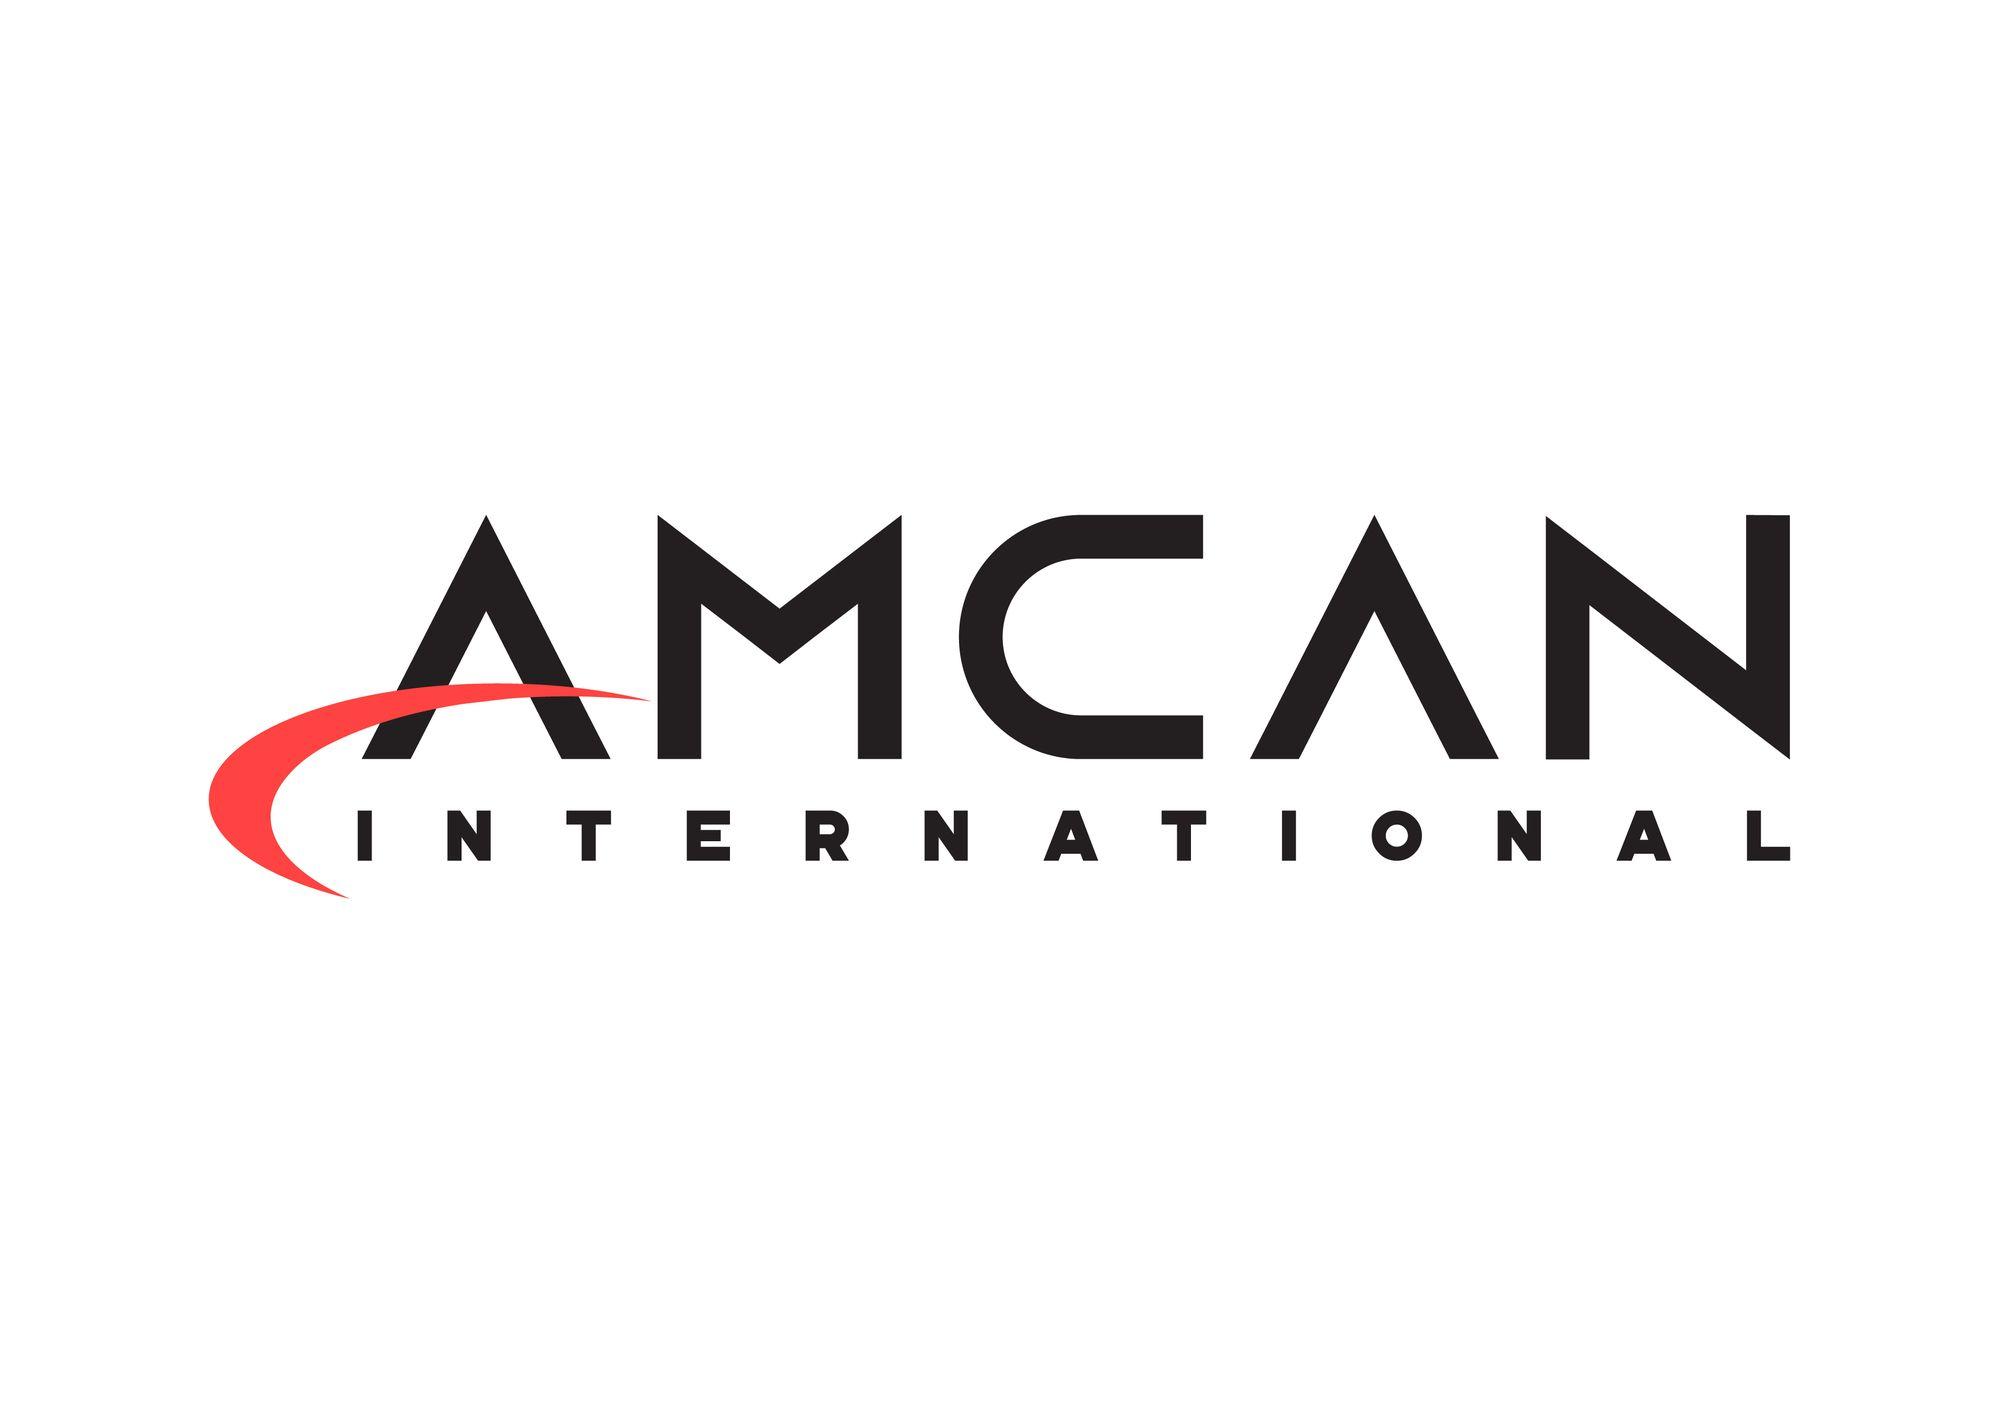 AmCan INTERNATIONAL